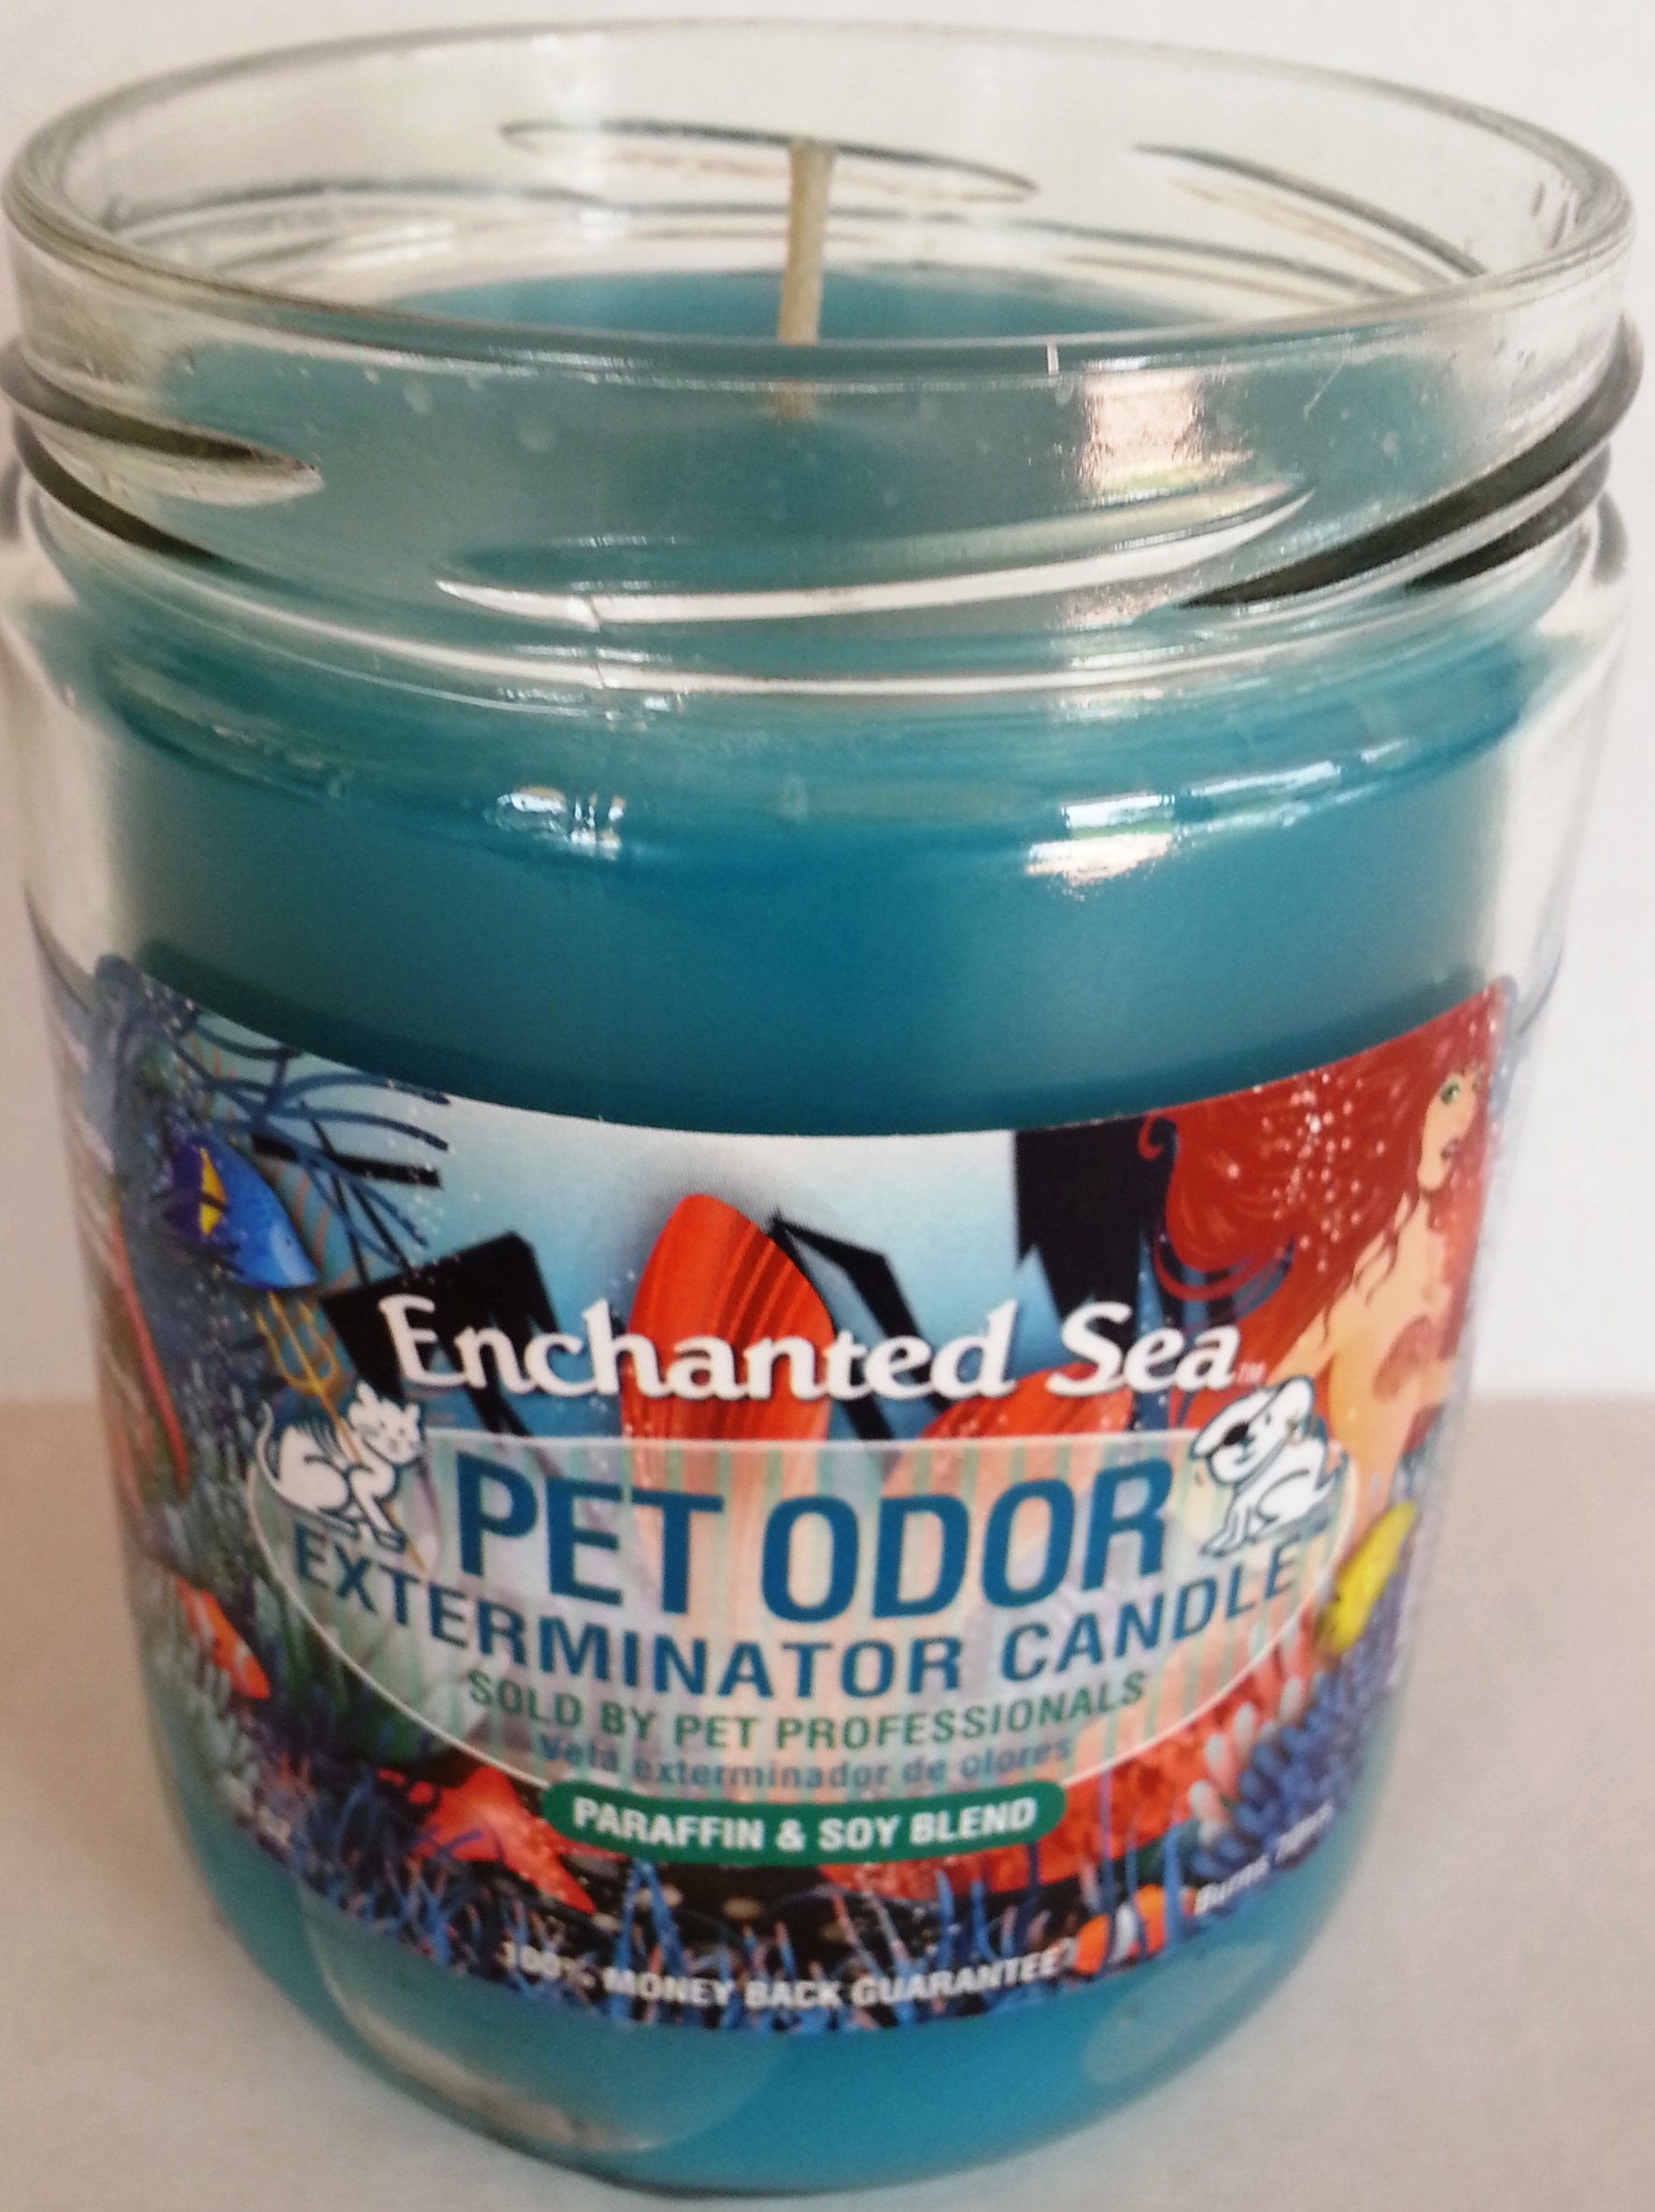 Pet Odor Exterminator Candle, Enchanted Sea,13 oz